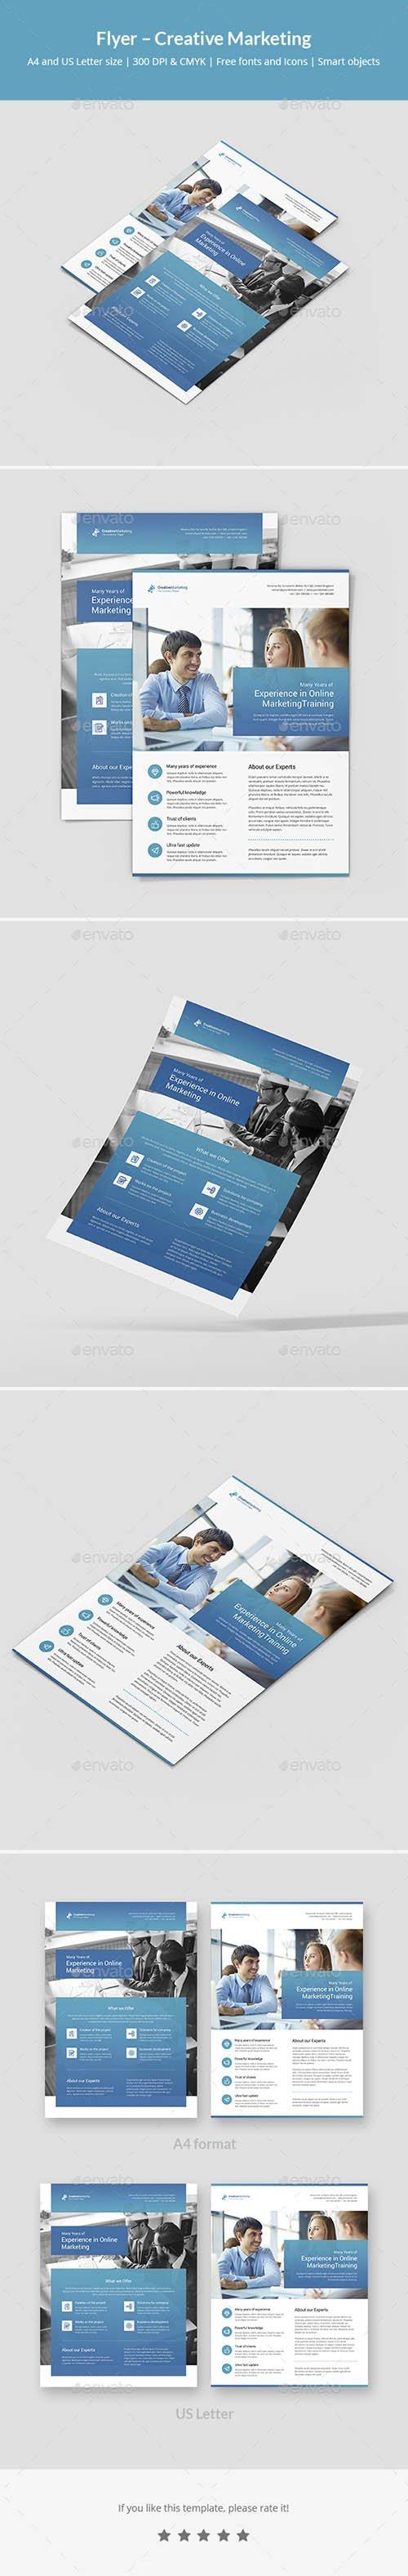 Flyer – Creative Marketing 21445466